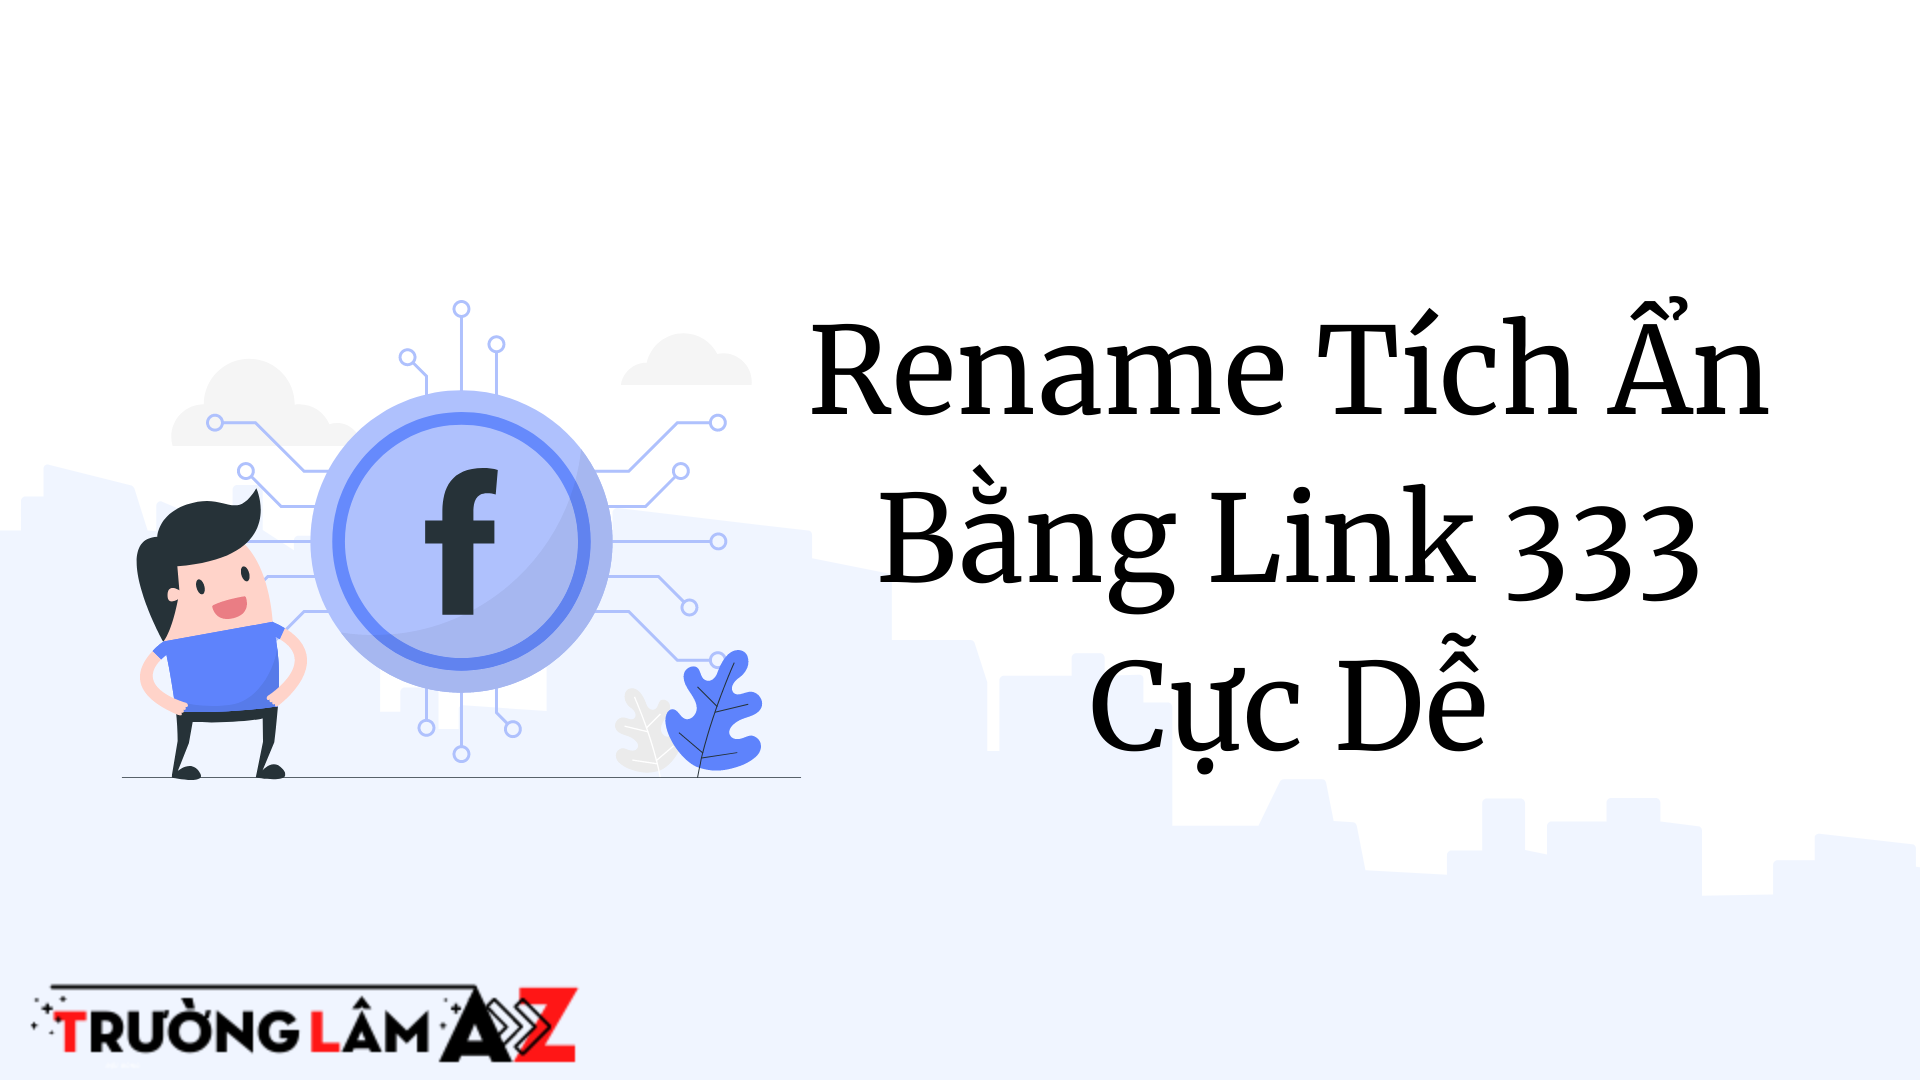 rename-tich-an-bang-link-333